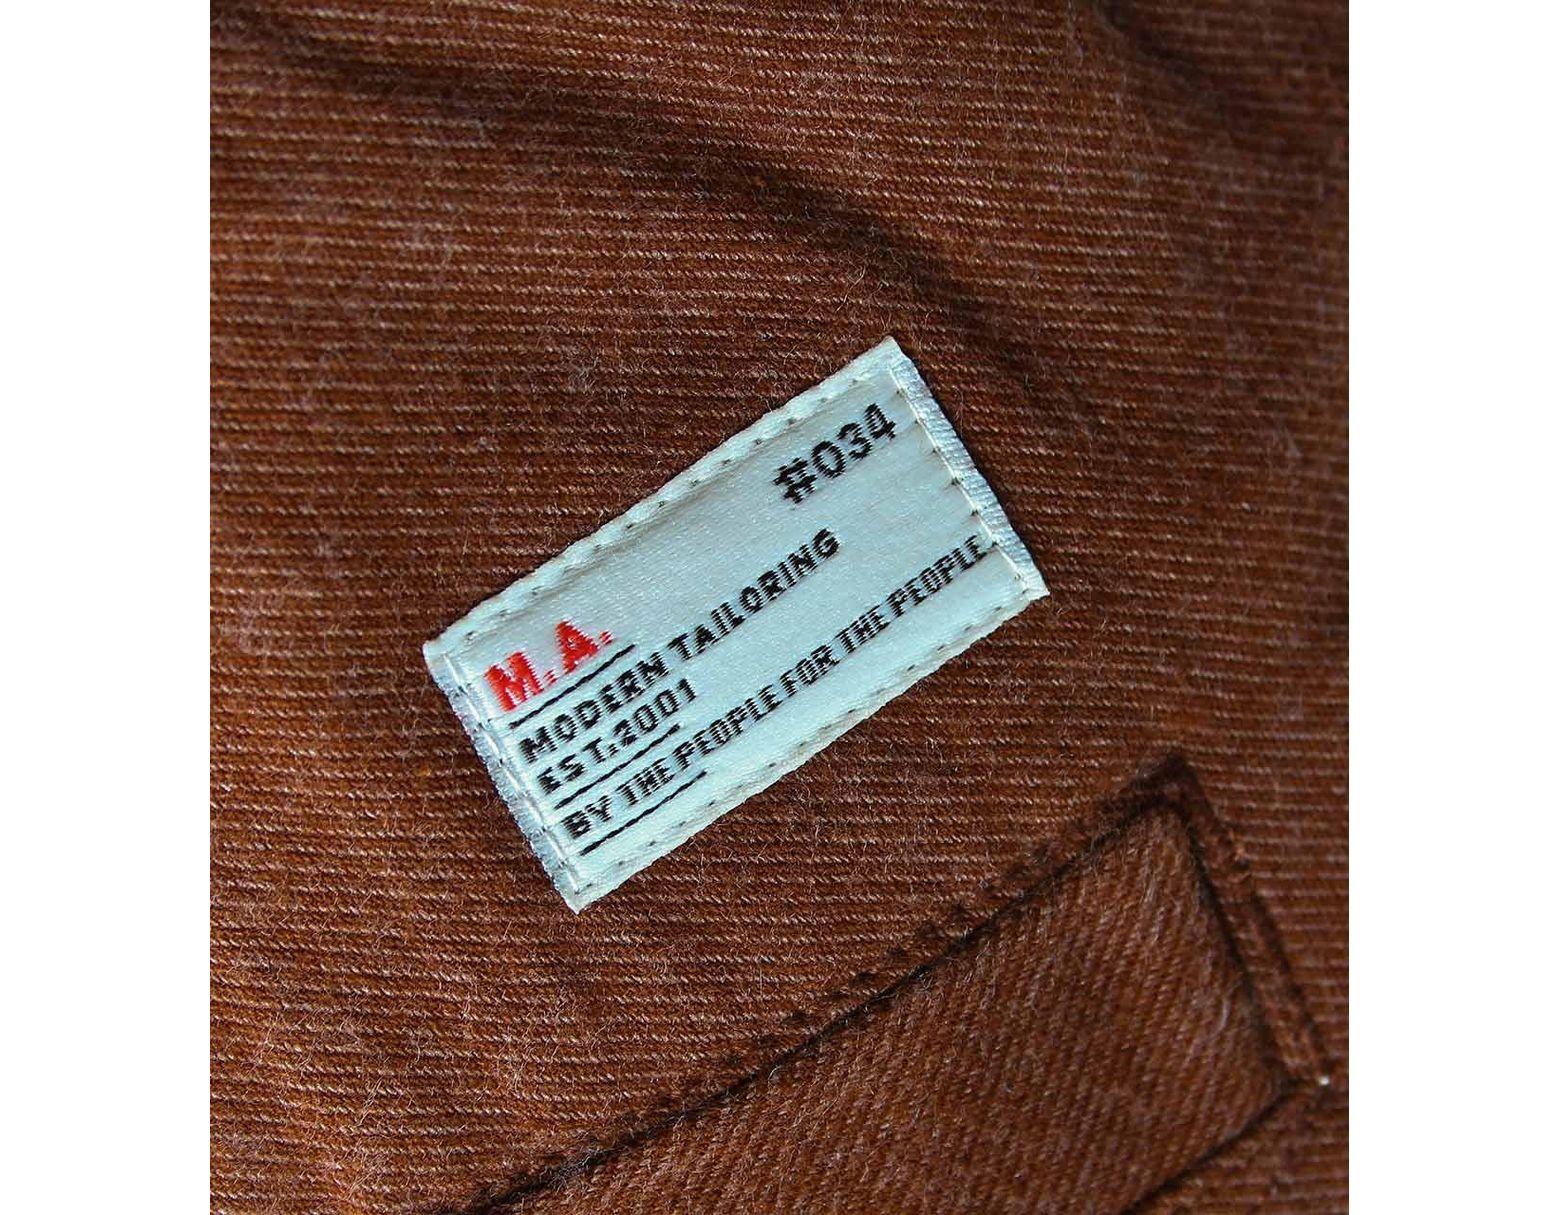 Marshall Artist Rust Orange Workshop Chino Trousers in Brown